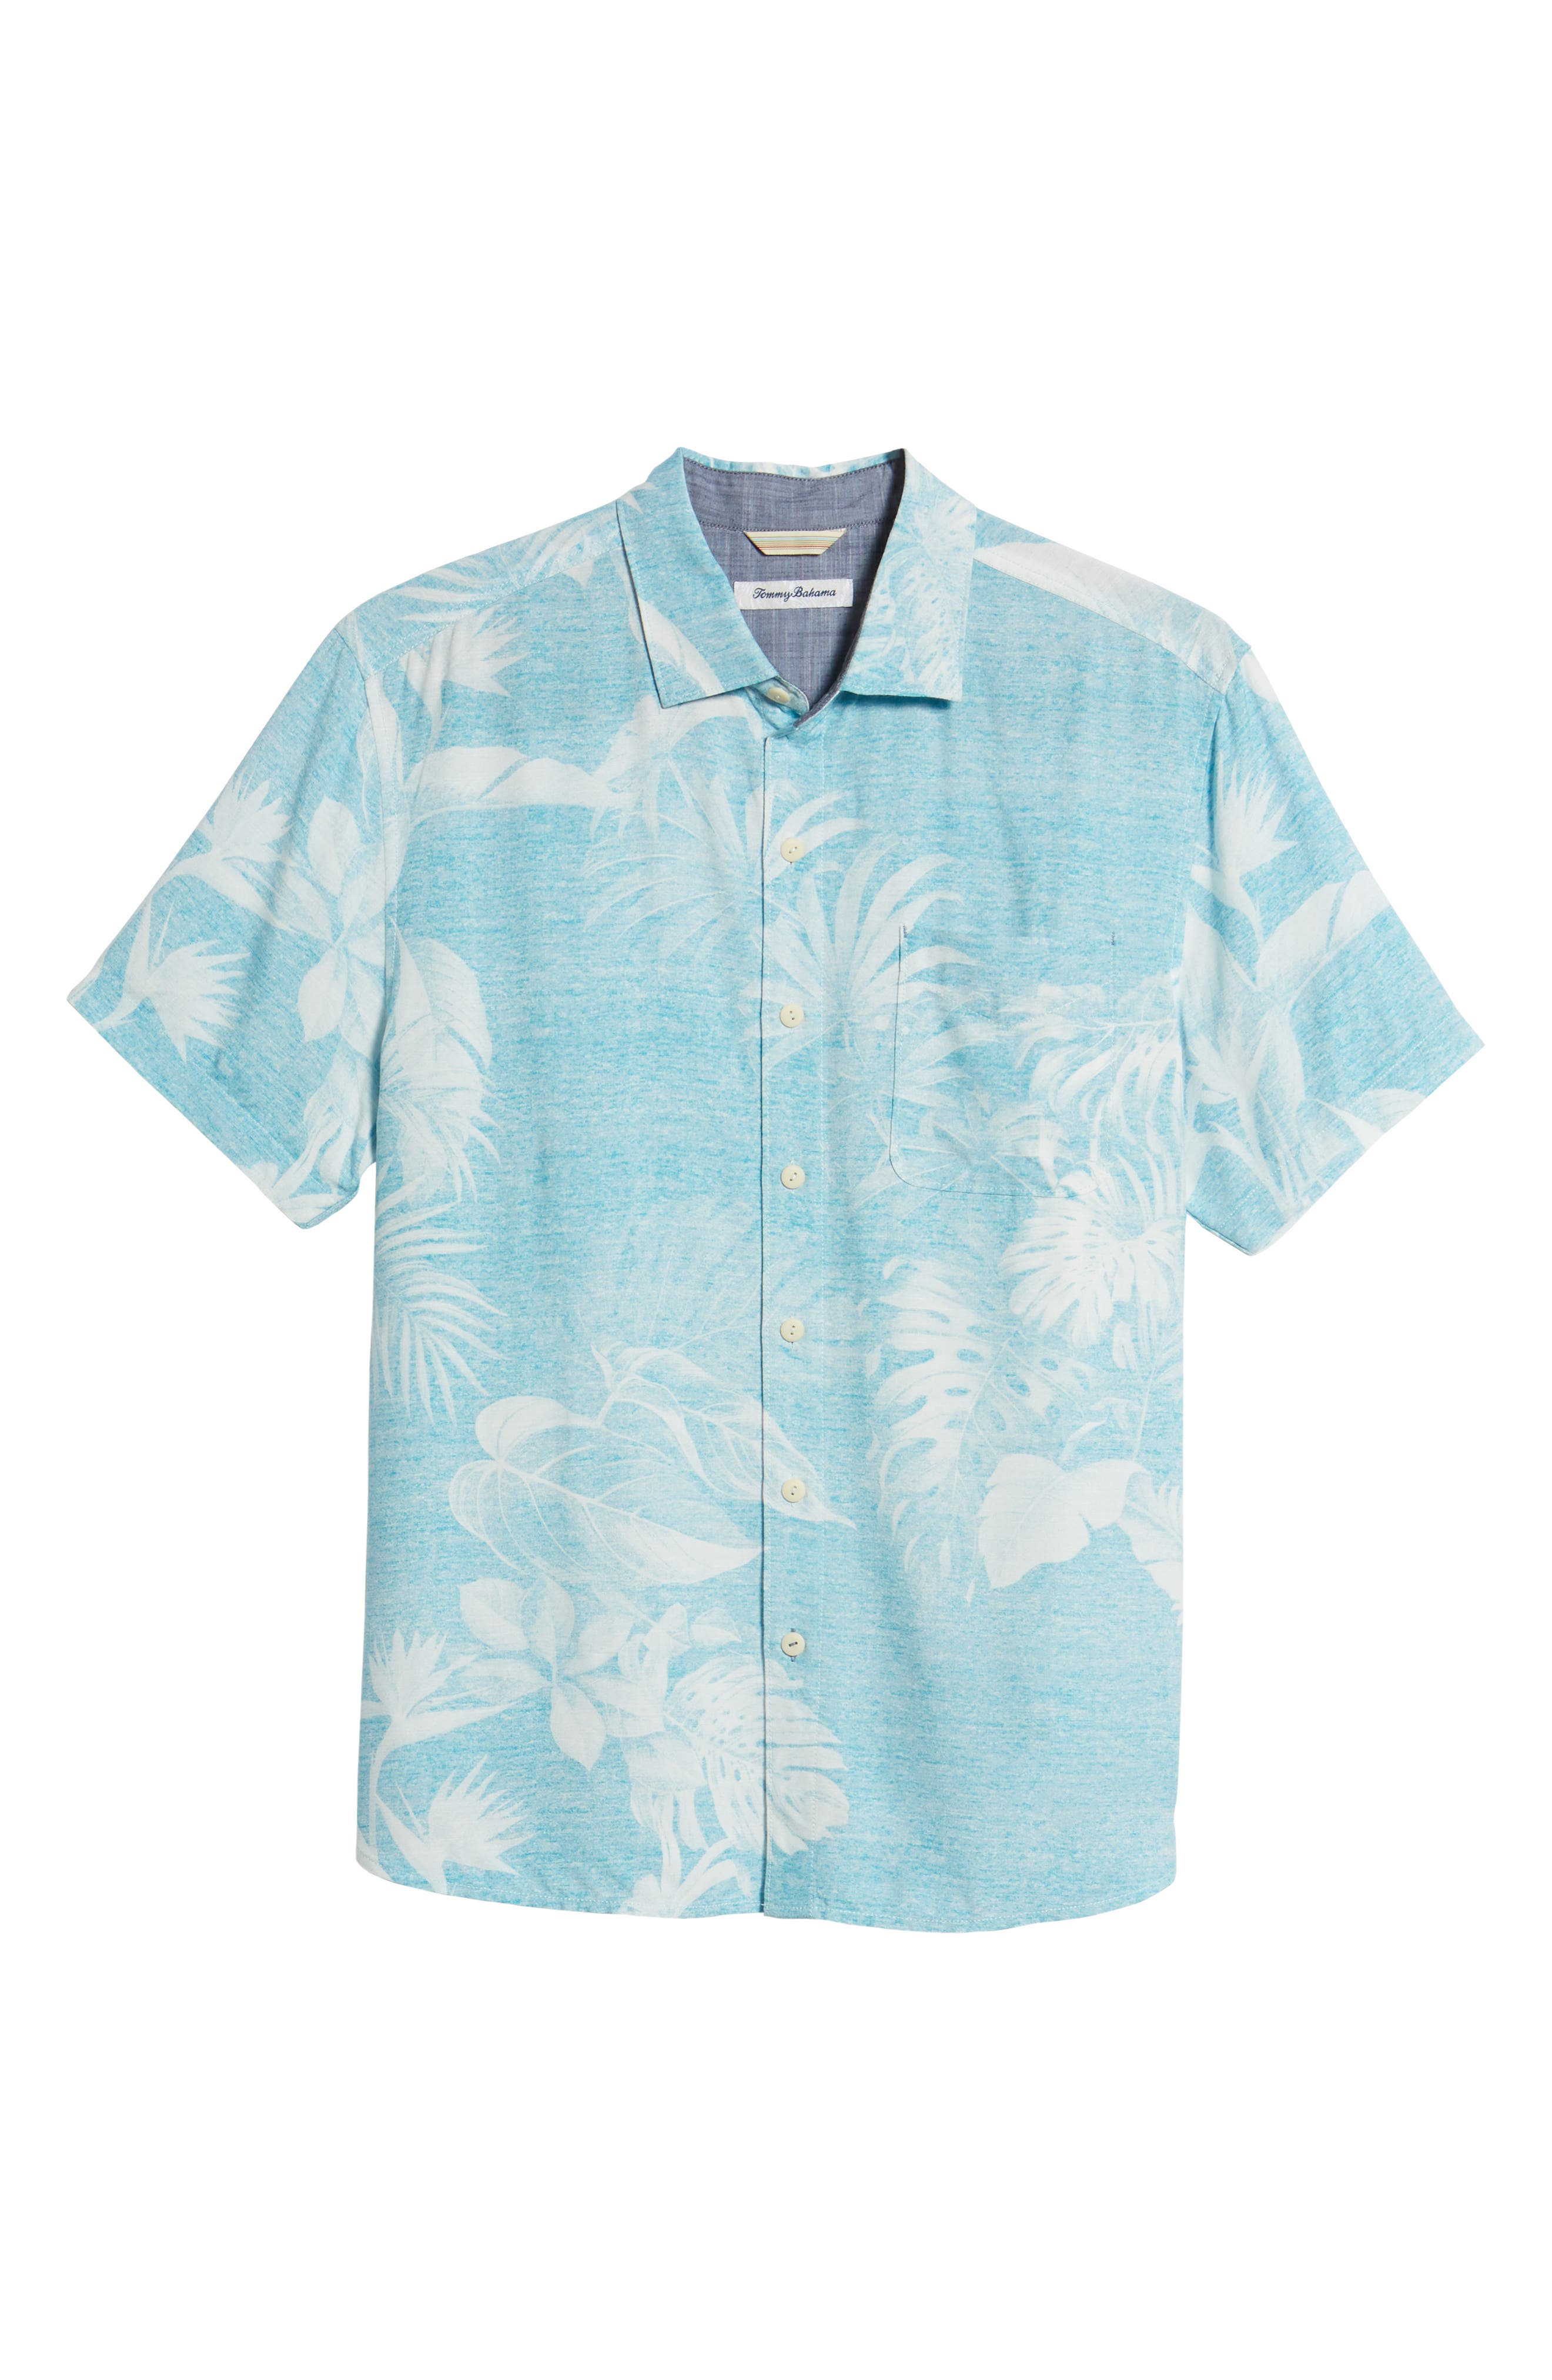 Grande Fronds Sport Shirt,                             Alternate thumbnail 6, color,                             Blue Radiance